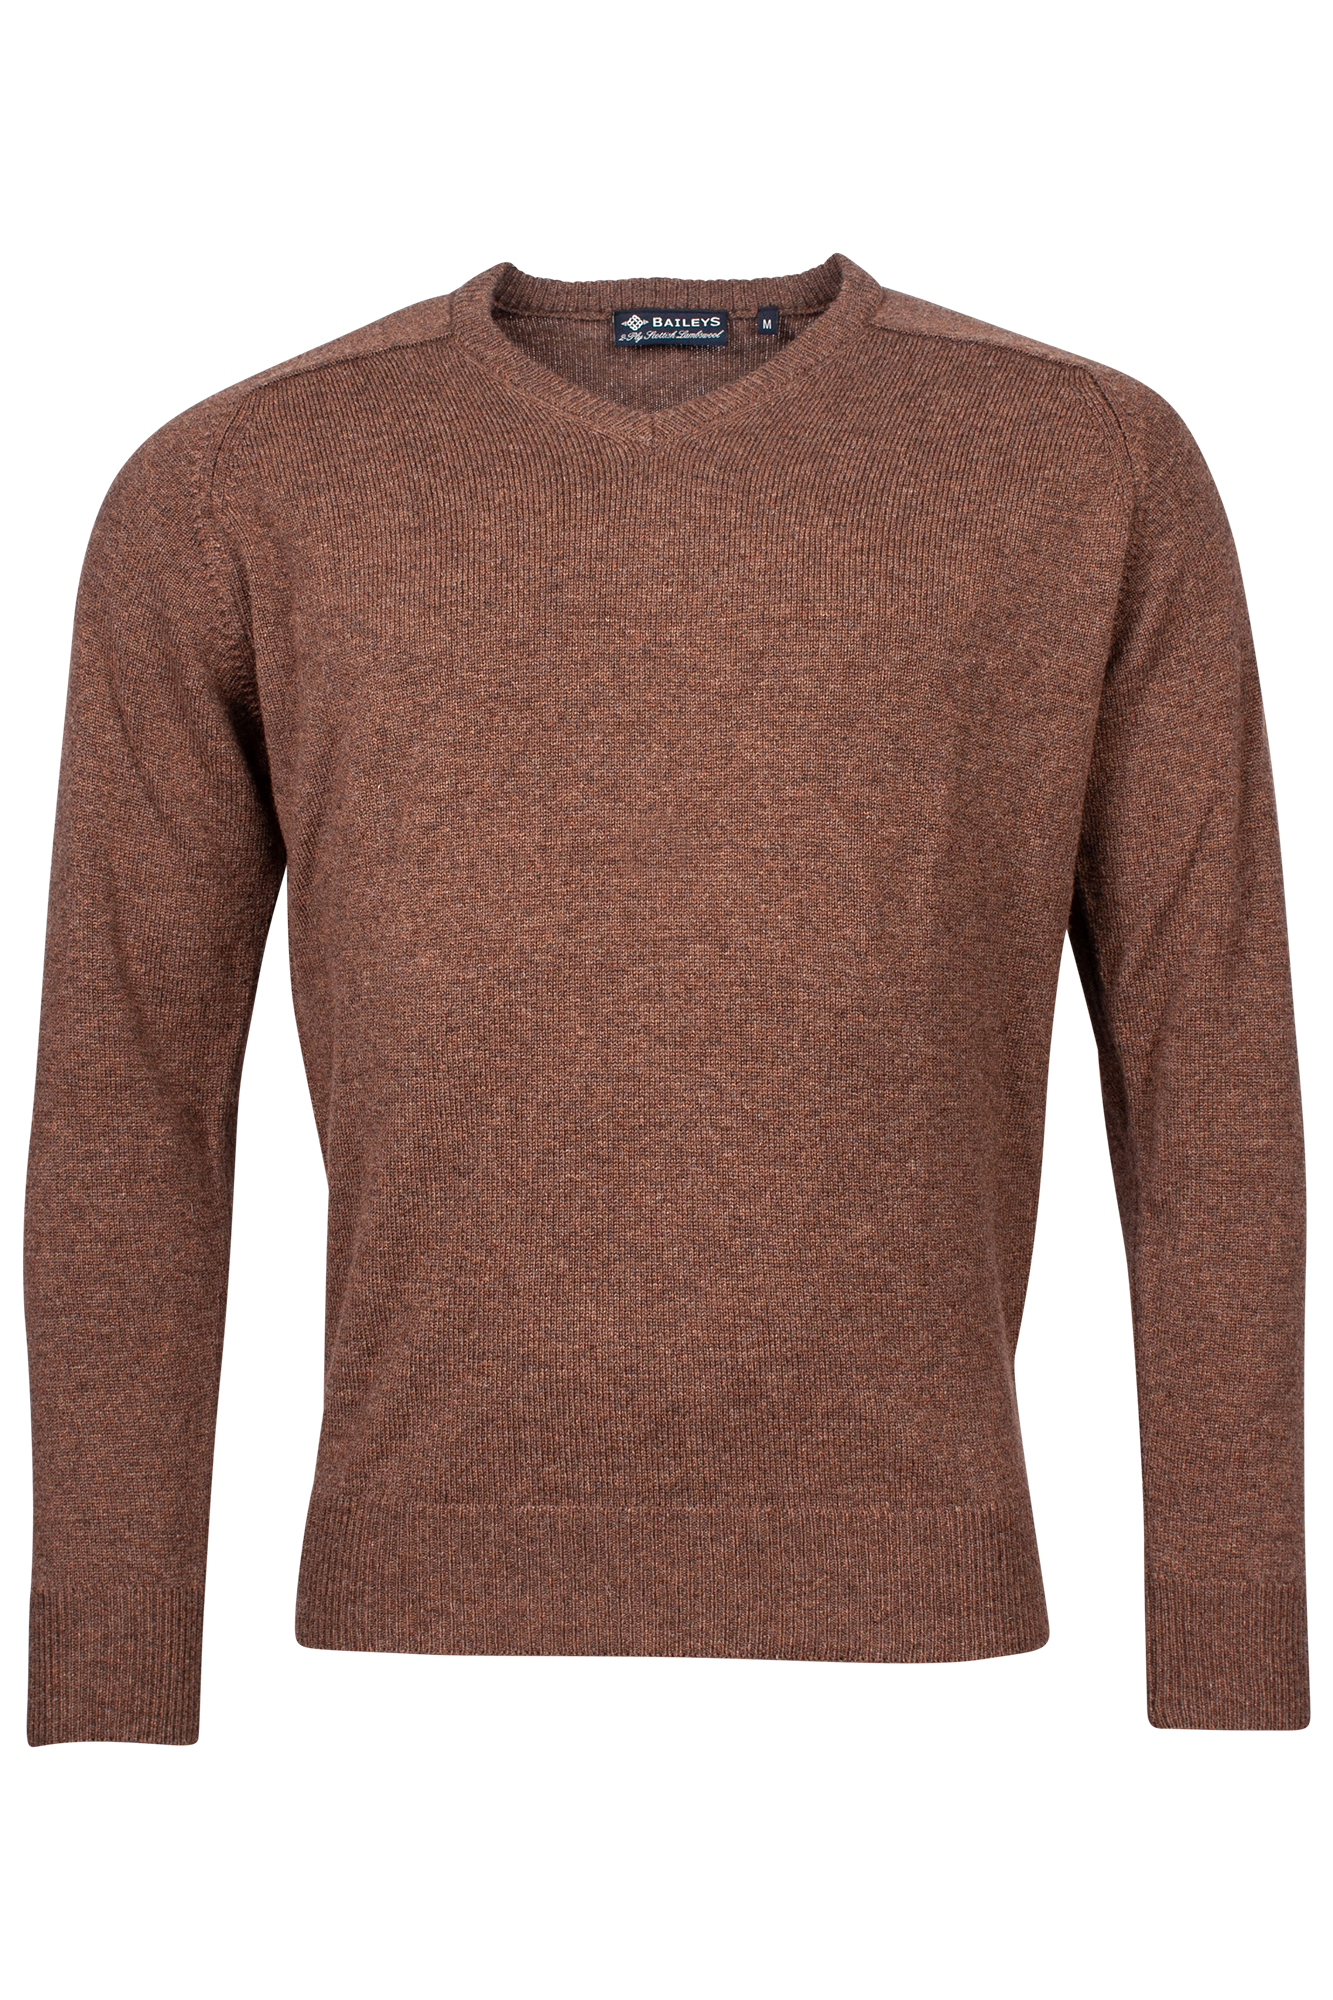 Baileys lamswollen pullover, v-hals, bruin